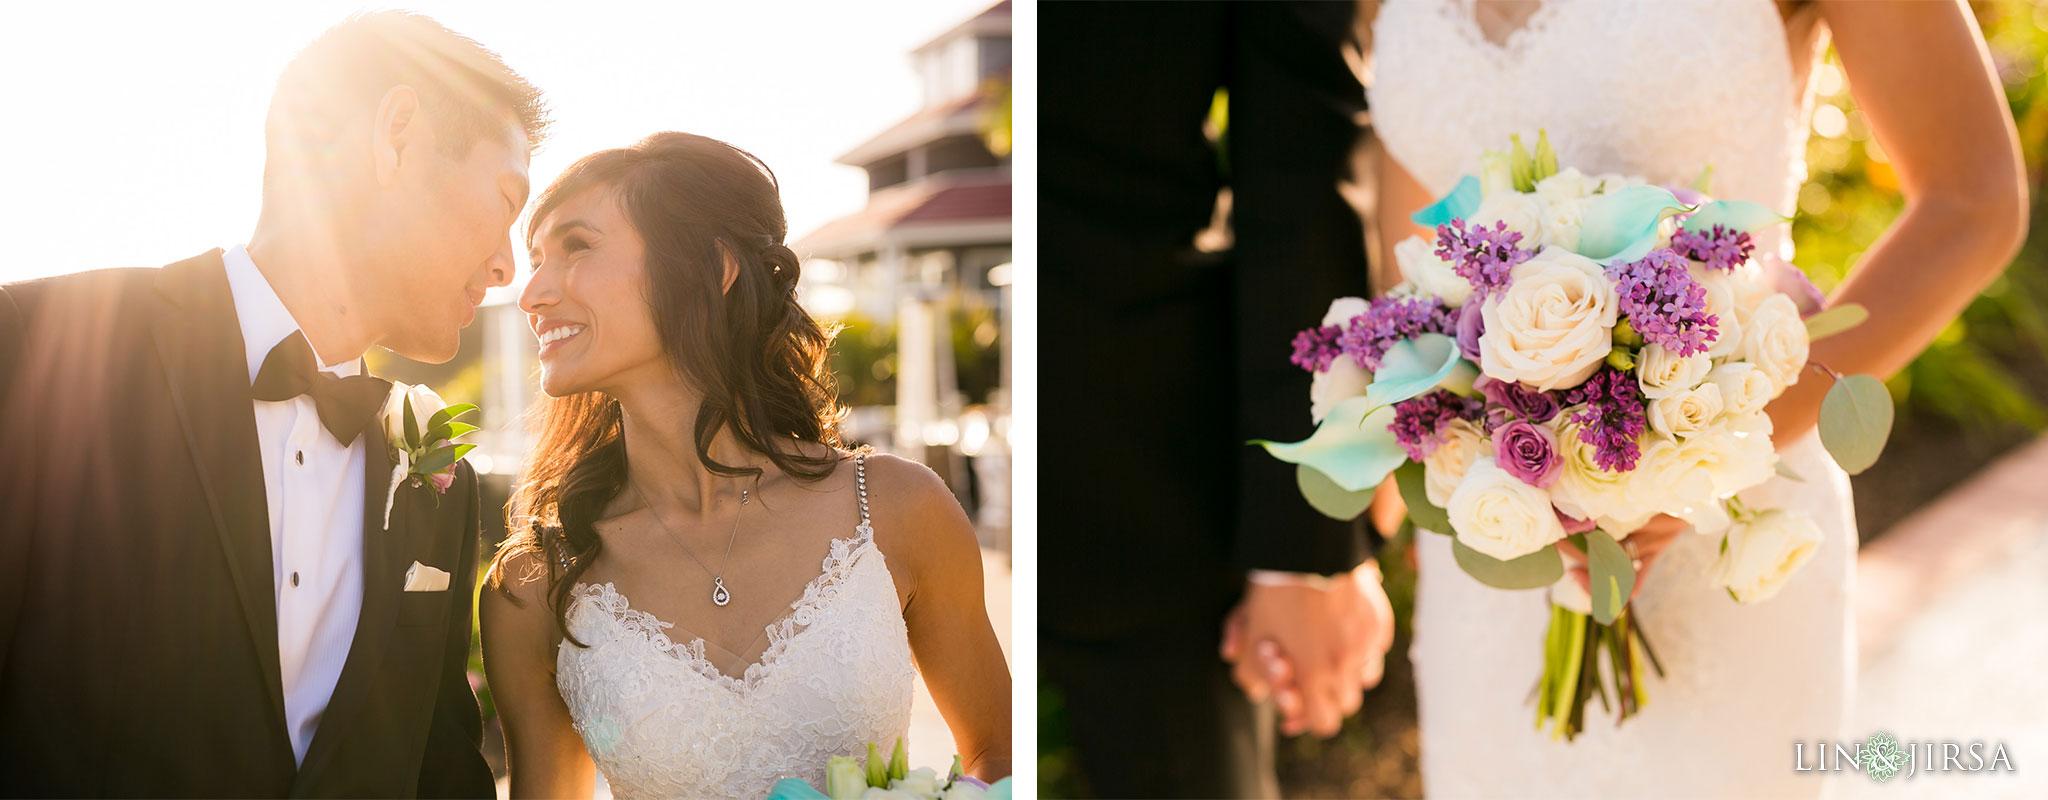 27 laguna cliffs marriott dana point wedding photography